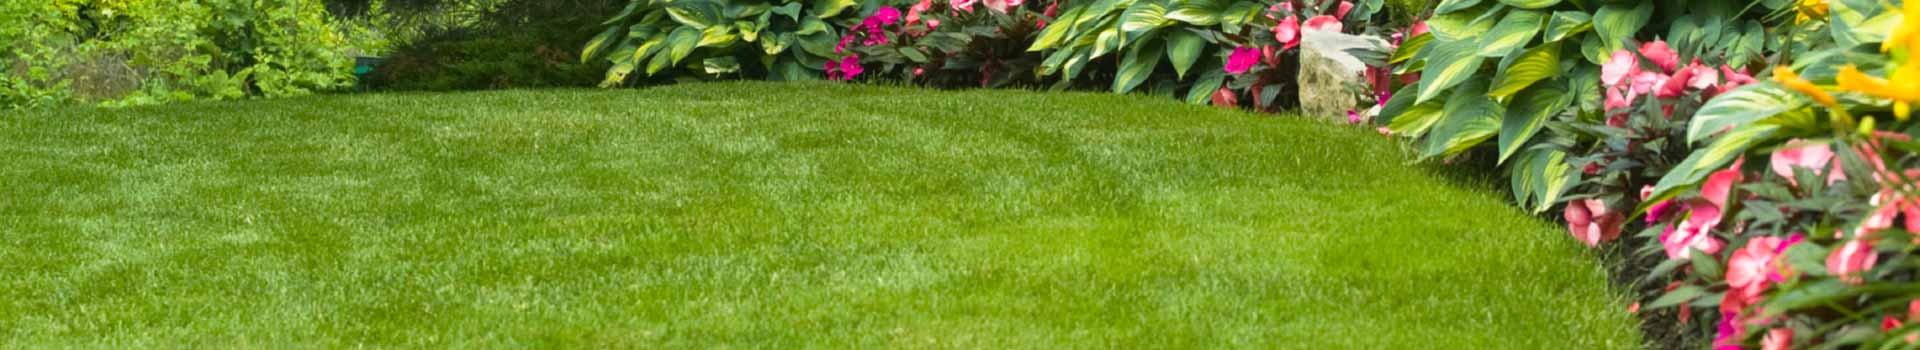 Create A New Lawn